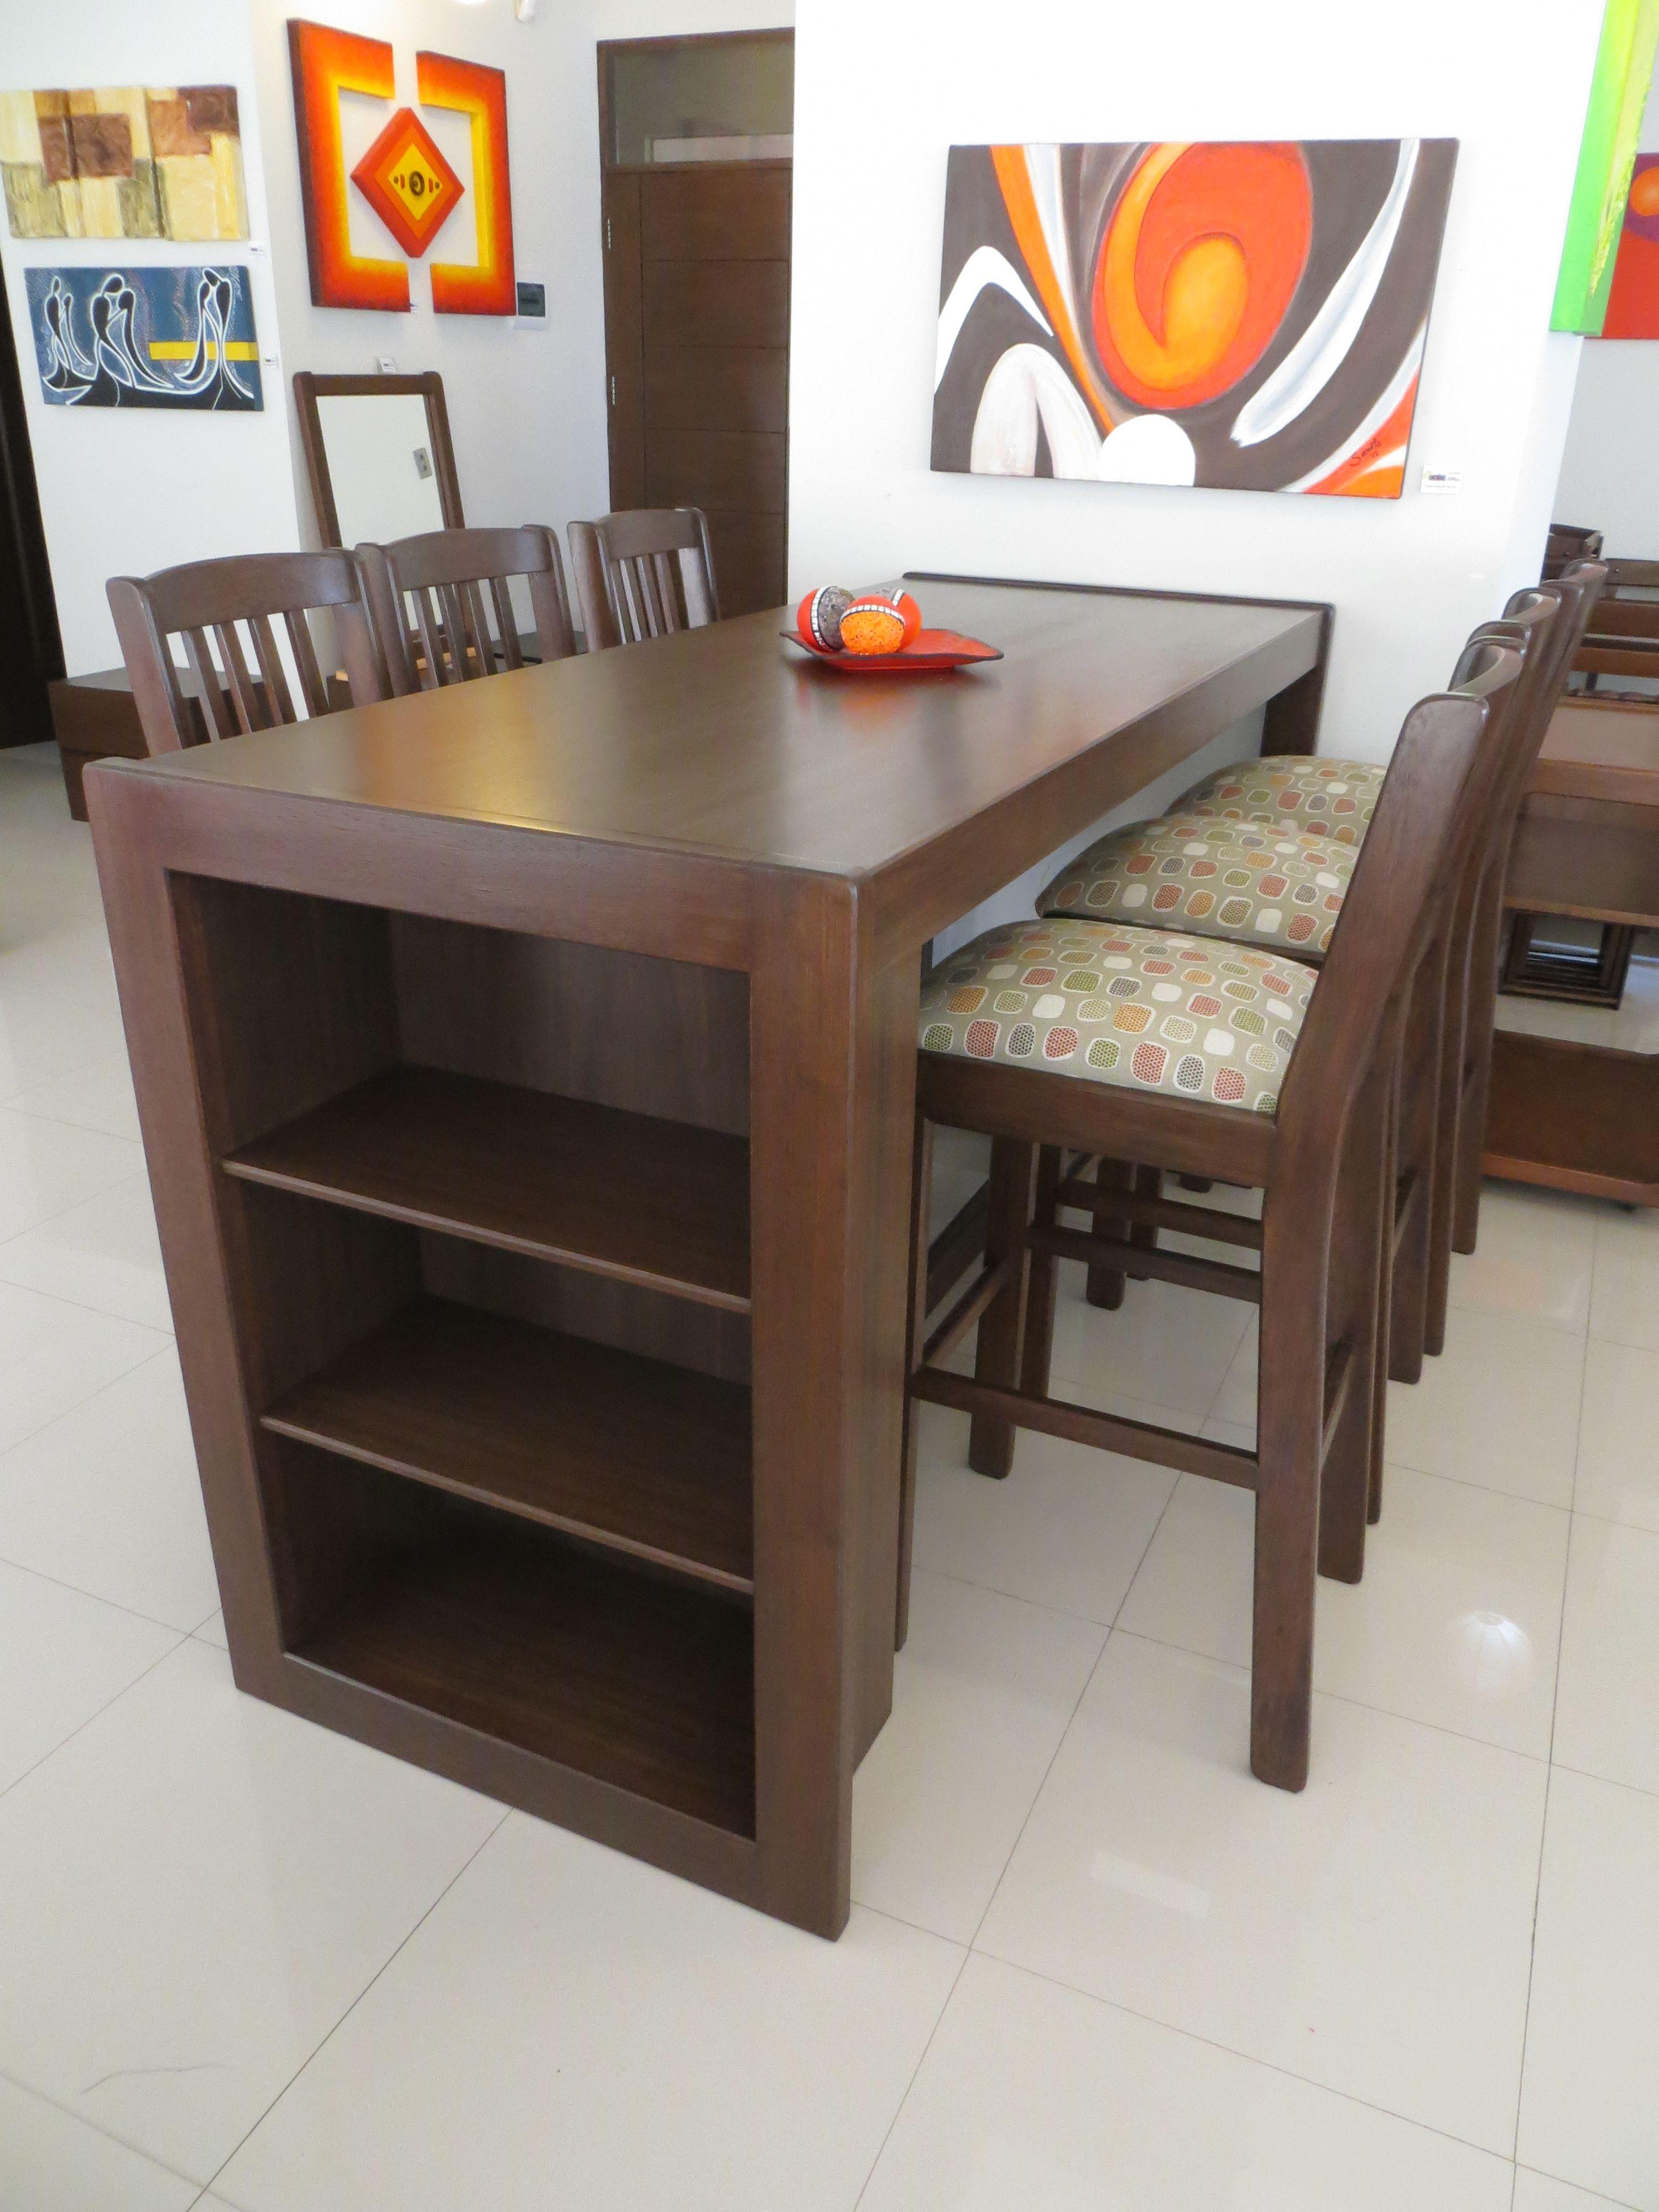 Comedor de diario con 6 sillas altas espacio con - Mesas de cocina rusticas ...